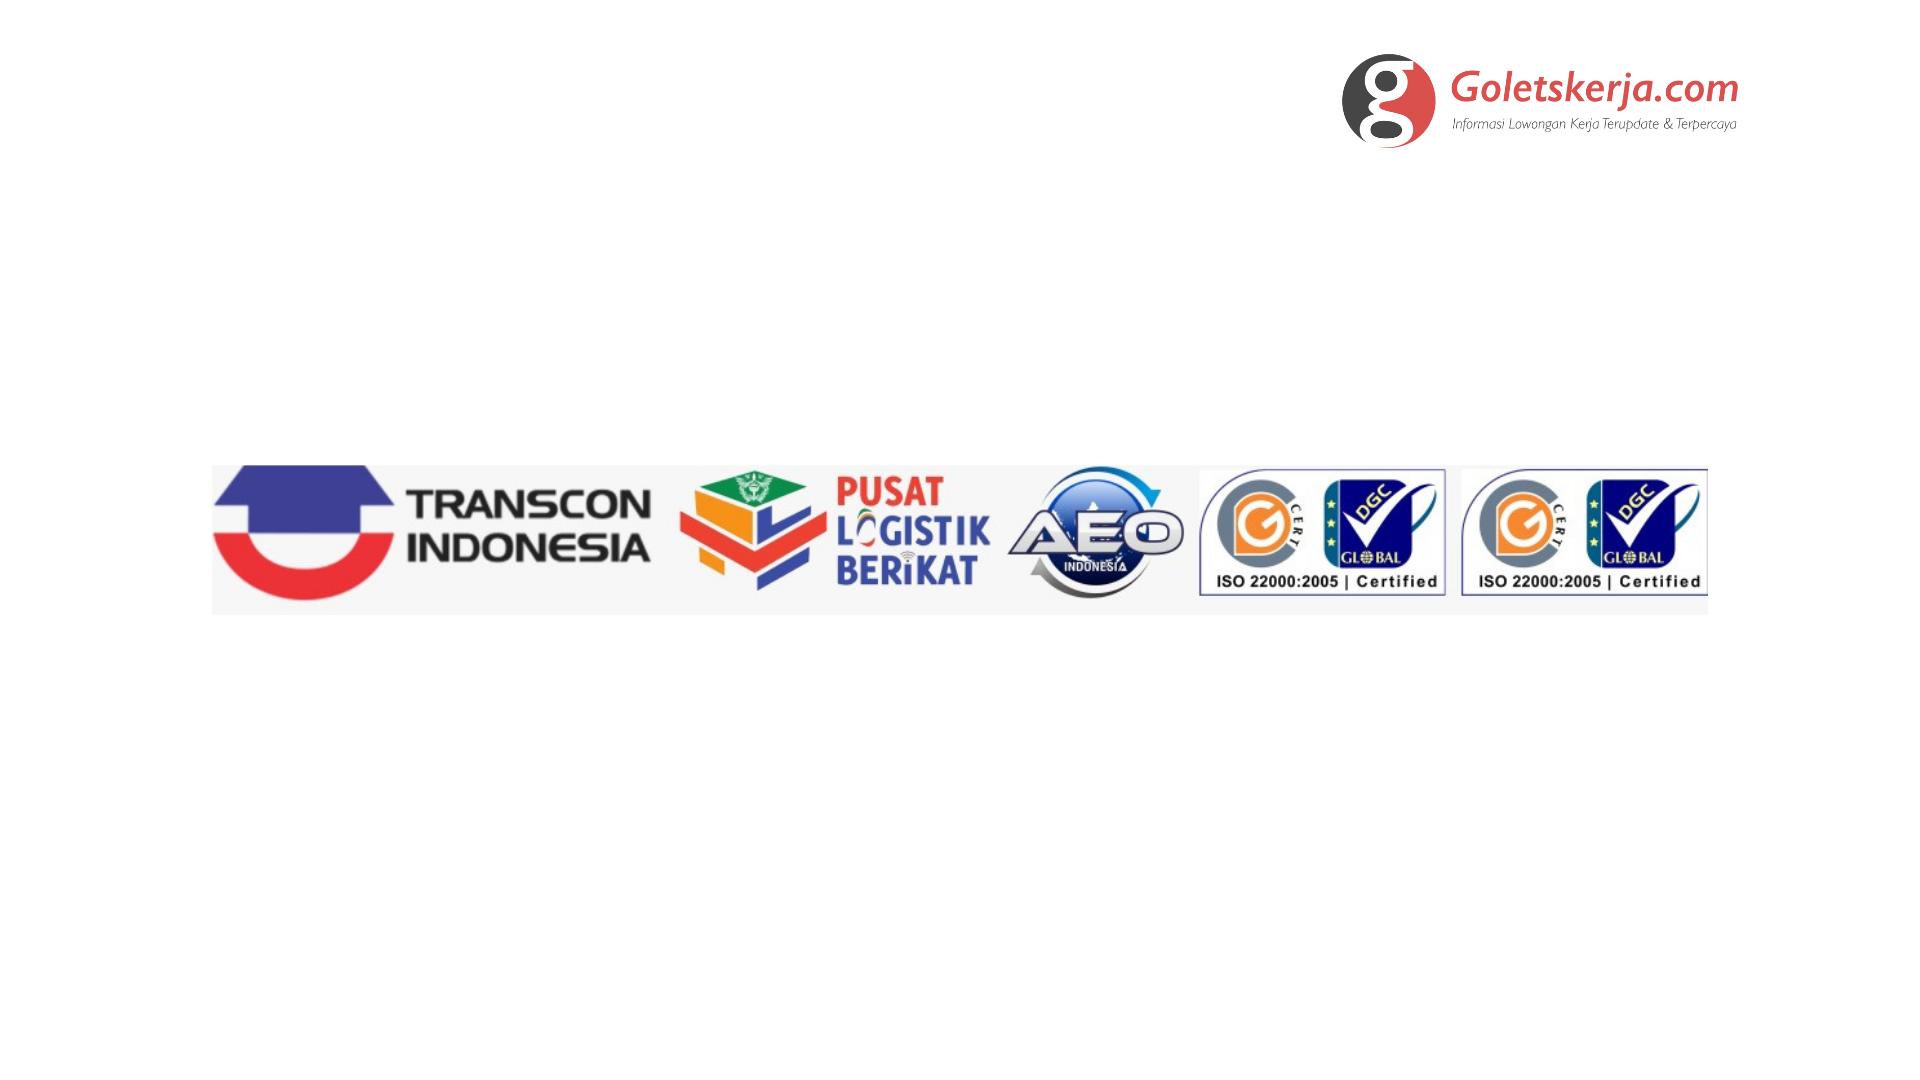 Lowongan Kerja Transcon Indonesia | September 2021